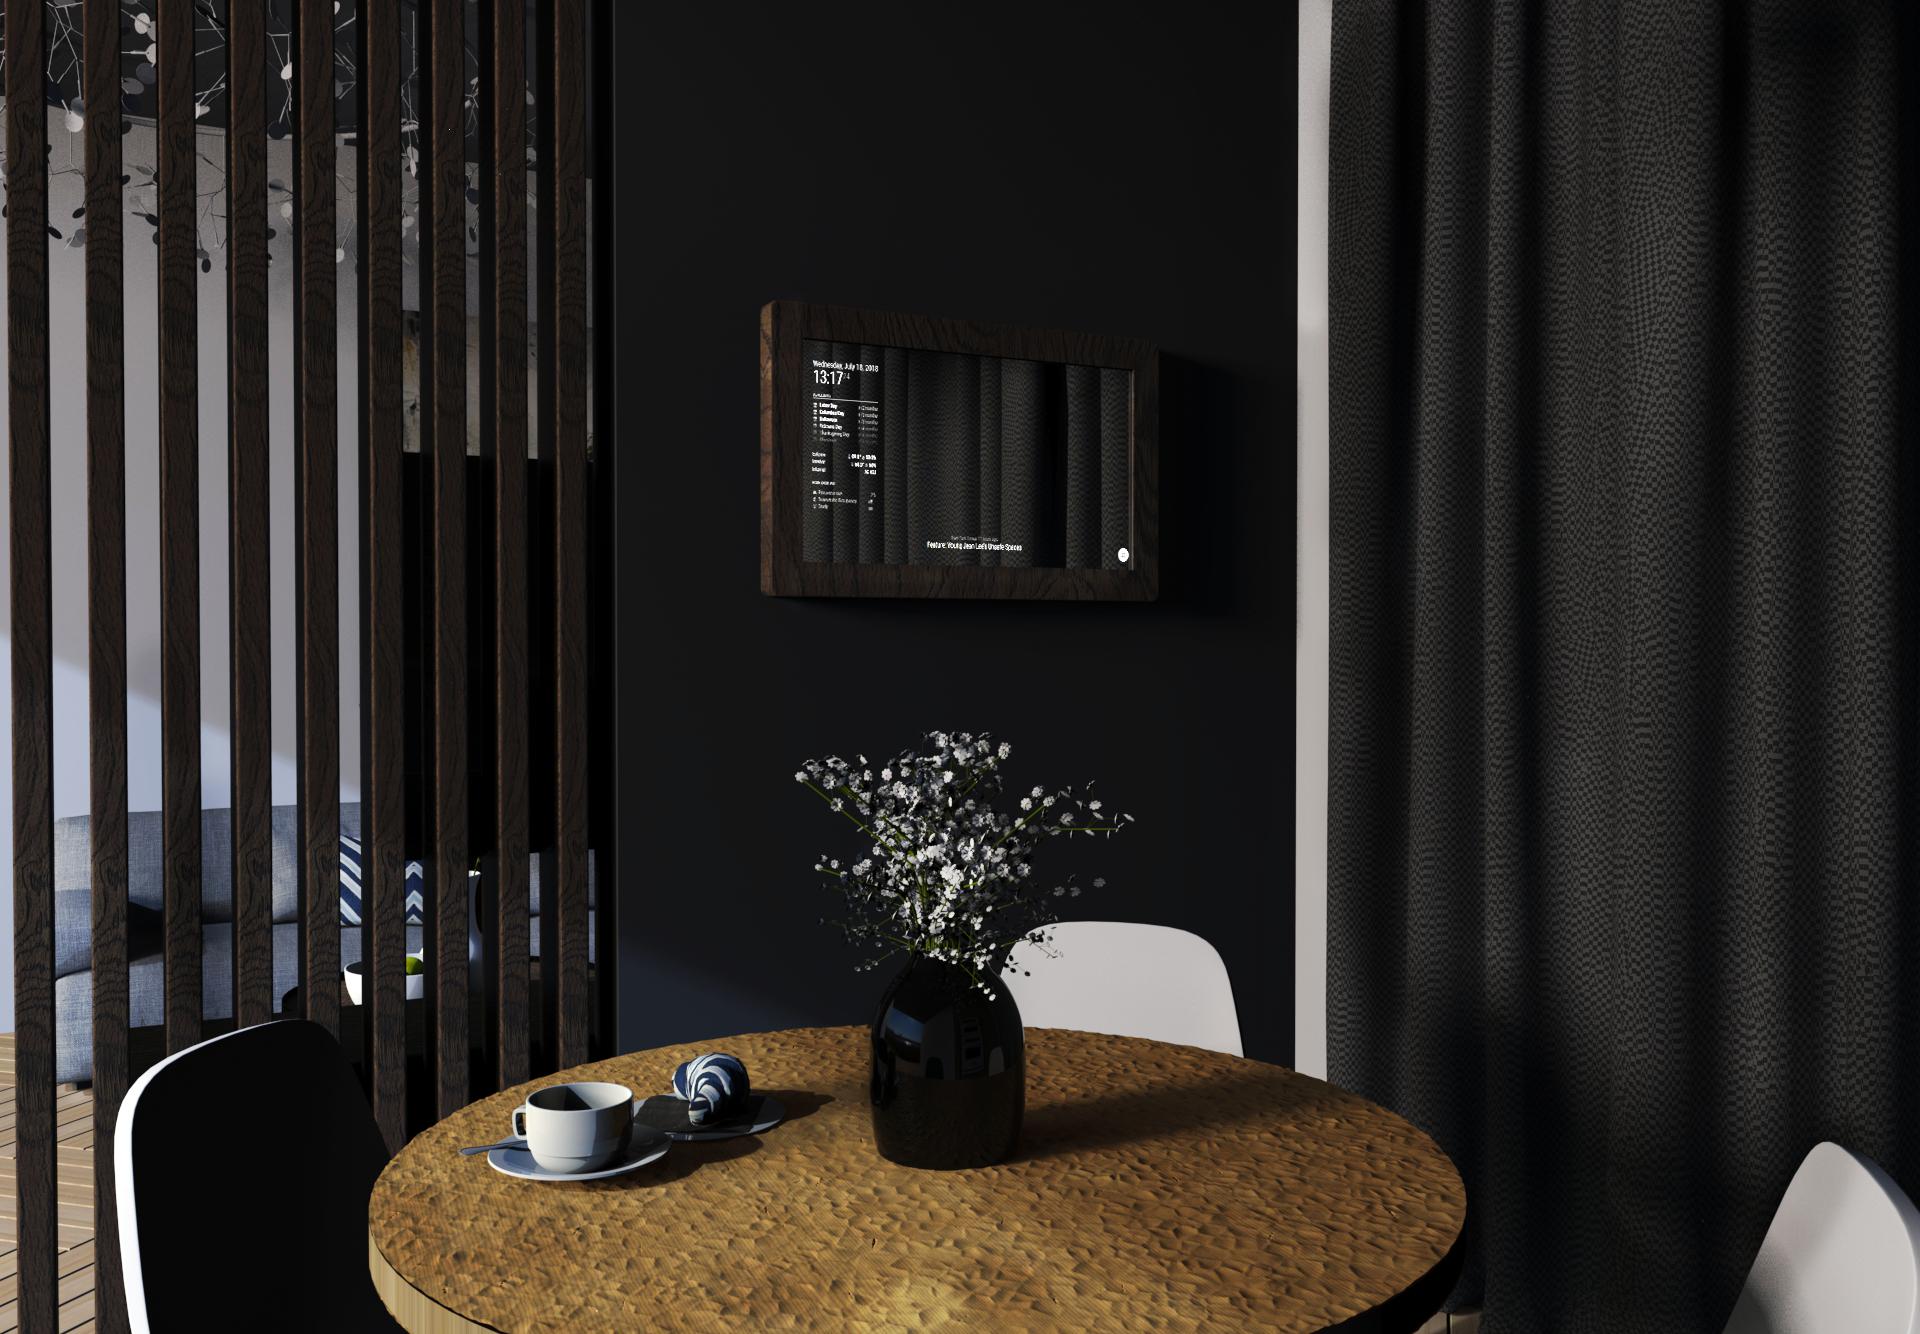 Touchscreen Smart Mirror, Mirr, Living Room Mirror